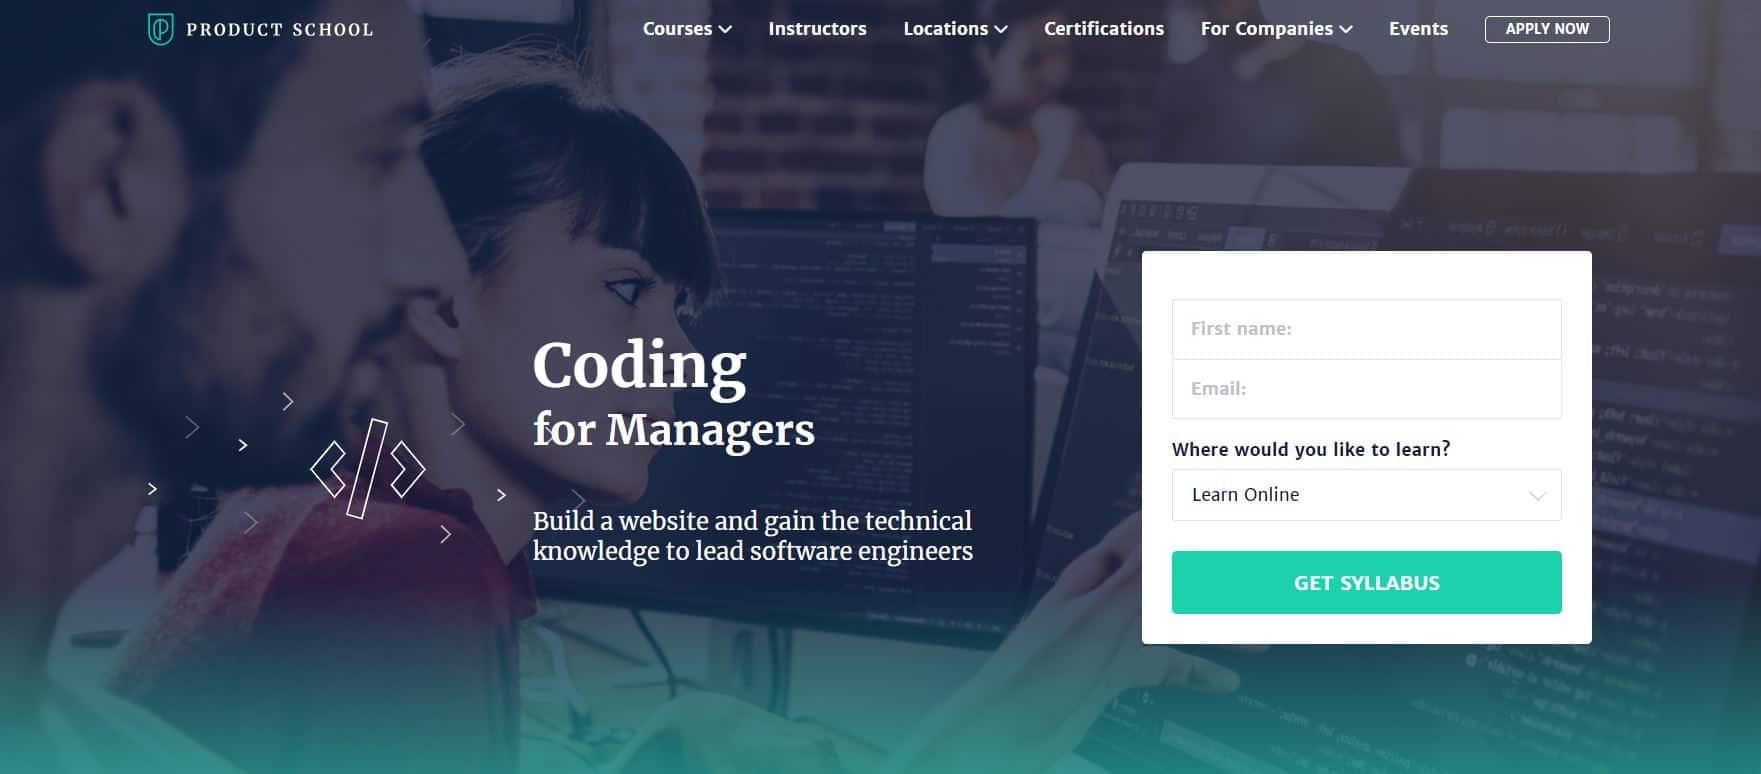 Product School's Coding Courses